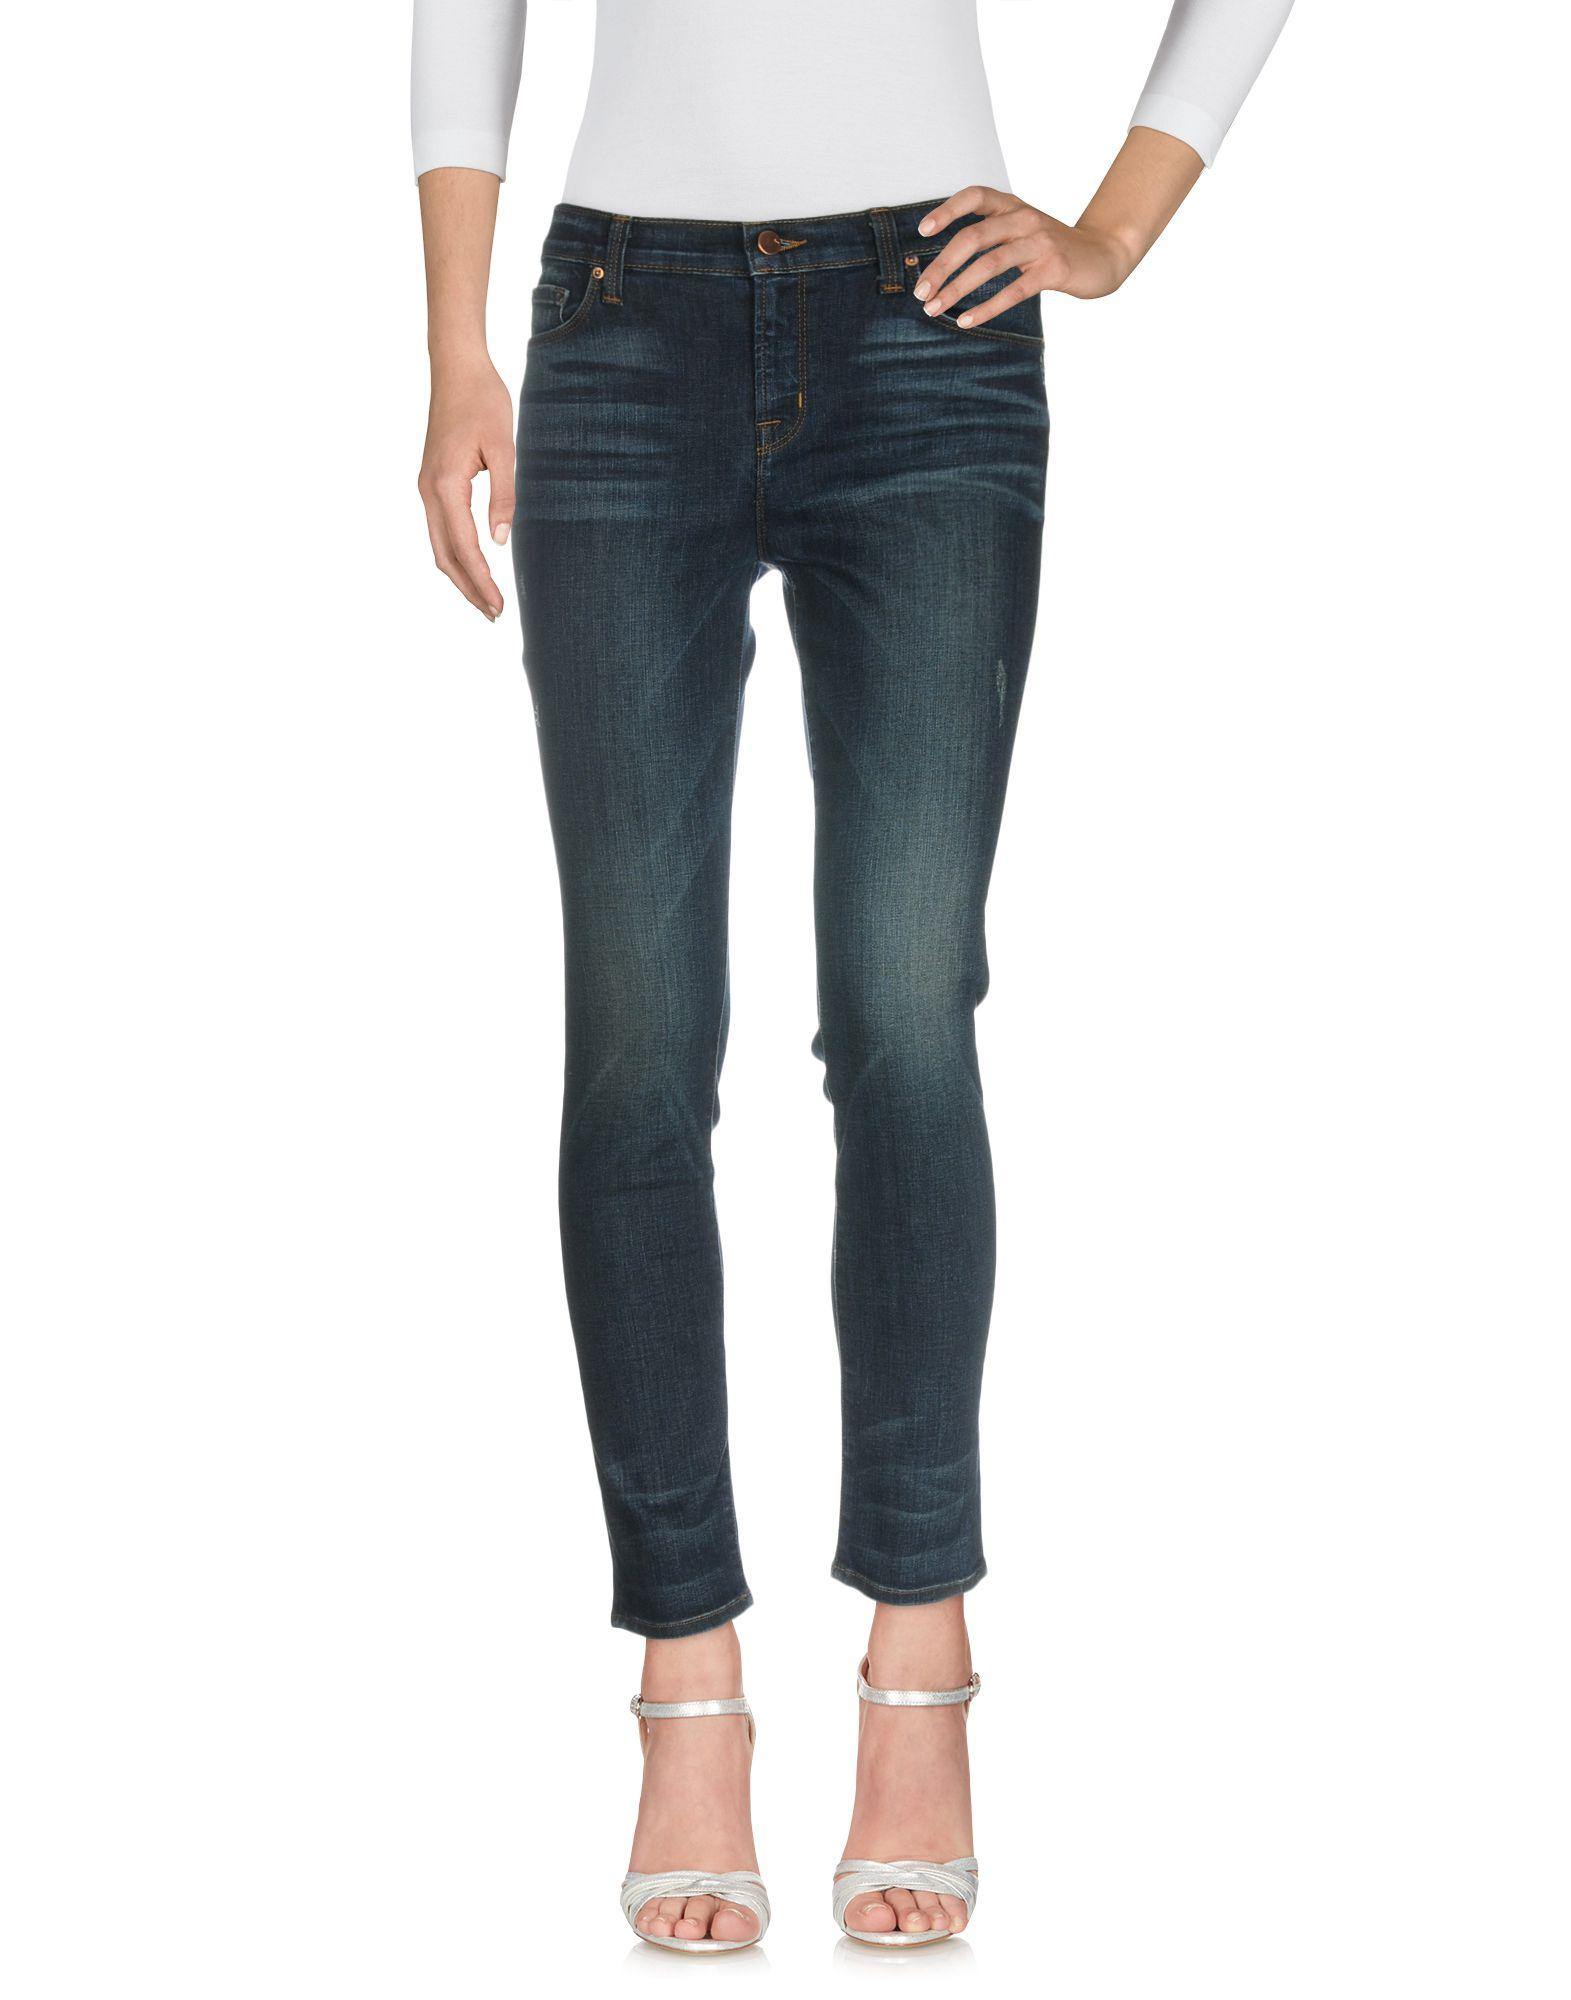 Pantaloni Jeans J Brand Donna - Acquista online su CNbhwjv